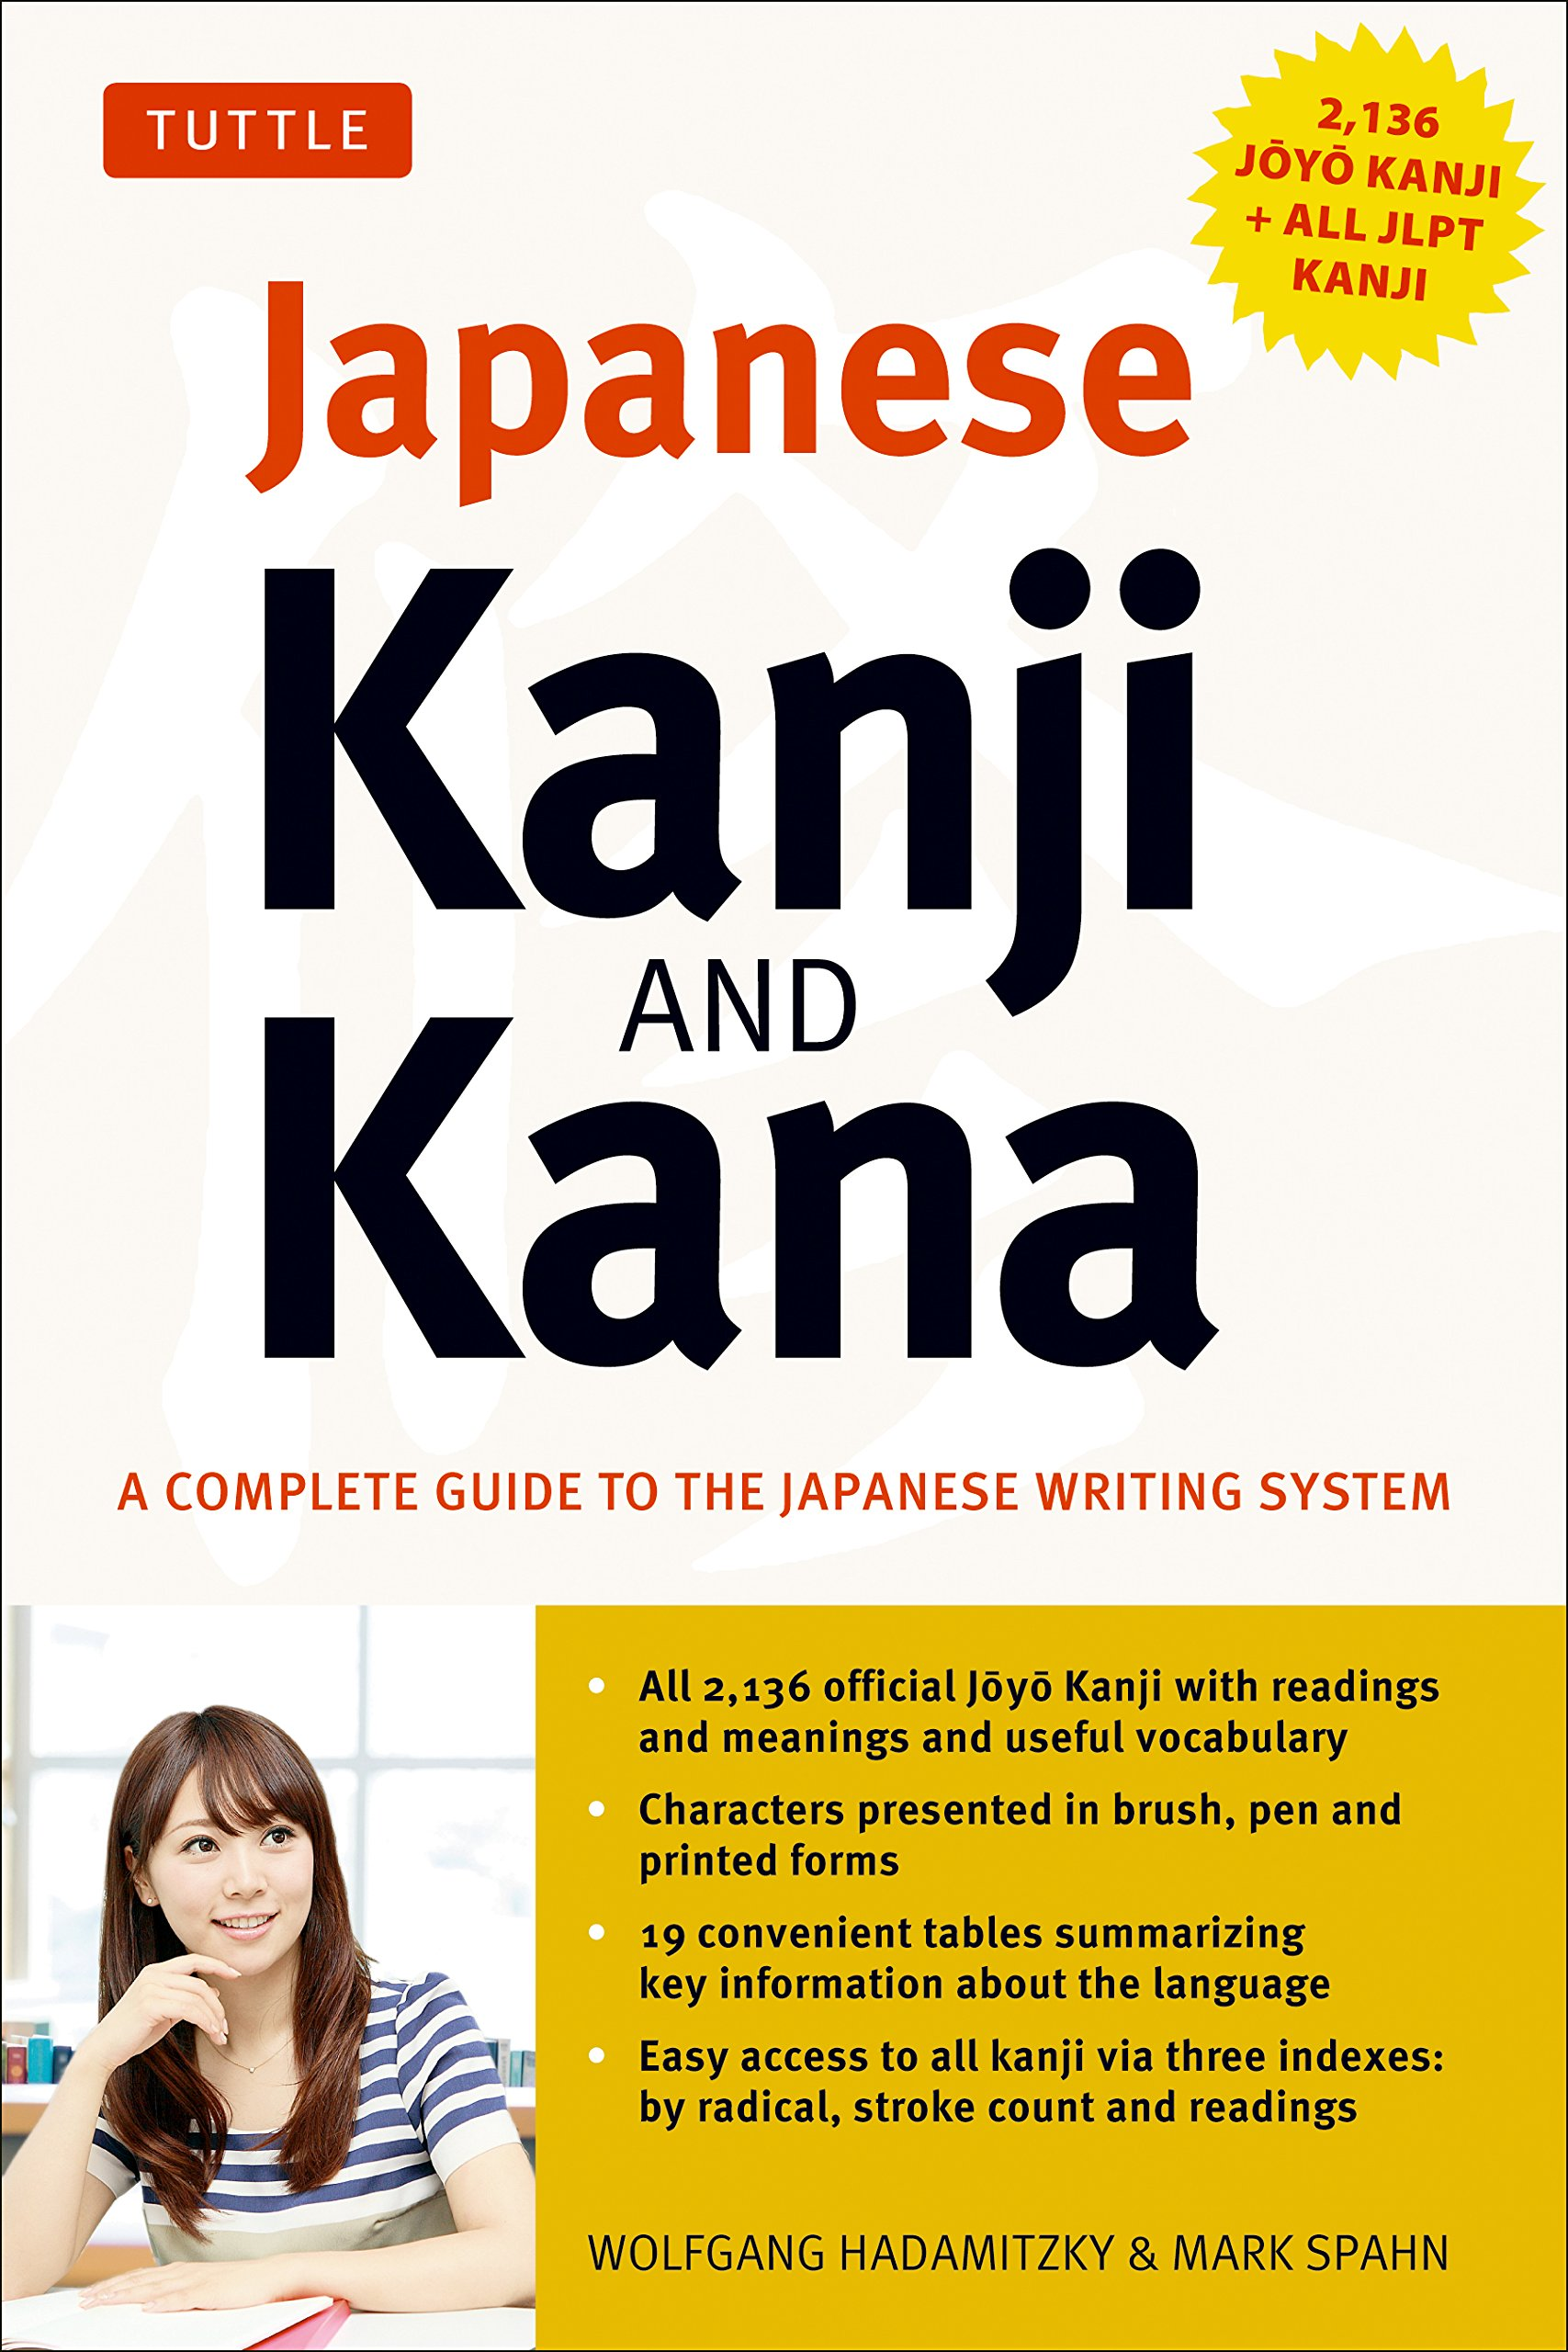 Amazon japanese kanji kana a complete guide to the japanese amazon japanese kanji kana a complete guide to the japanese writing system 9784805311165 wolfgang hadamitzky mark spahn books biocorpaavc Gallery